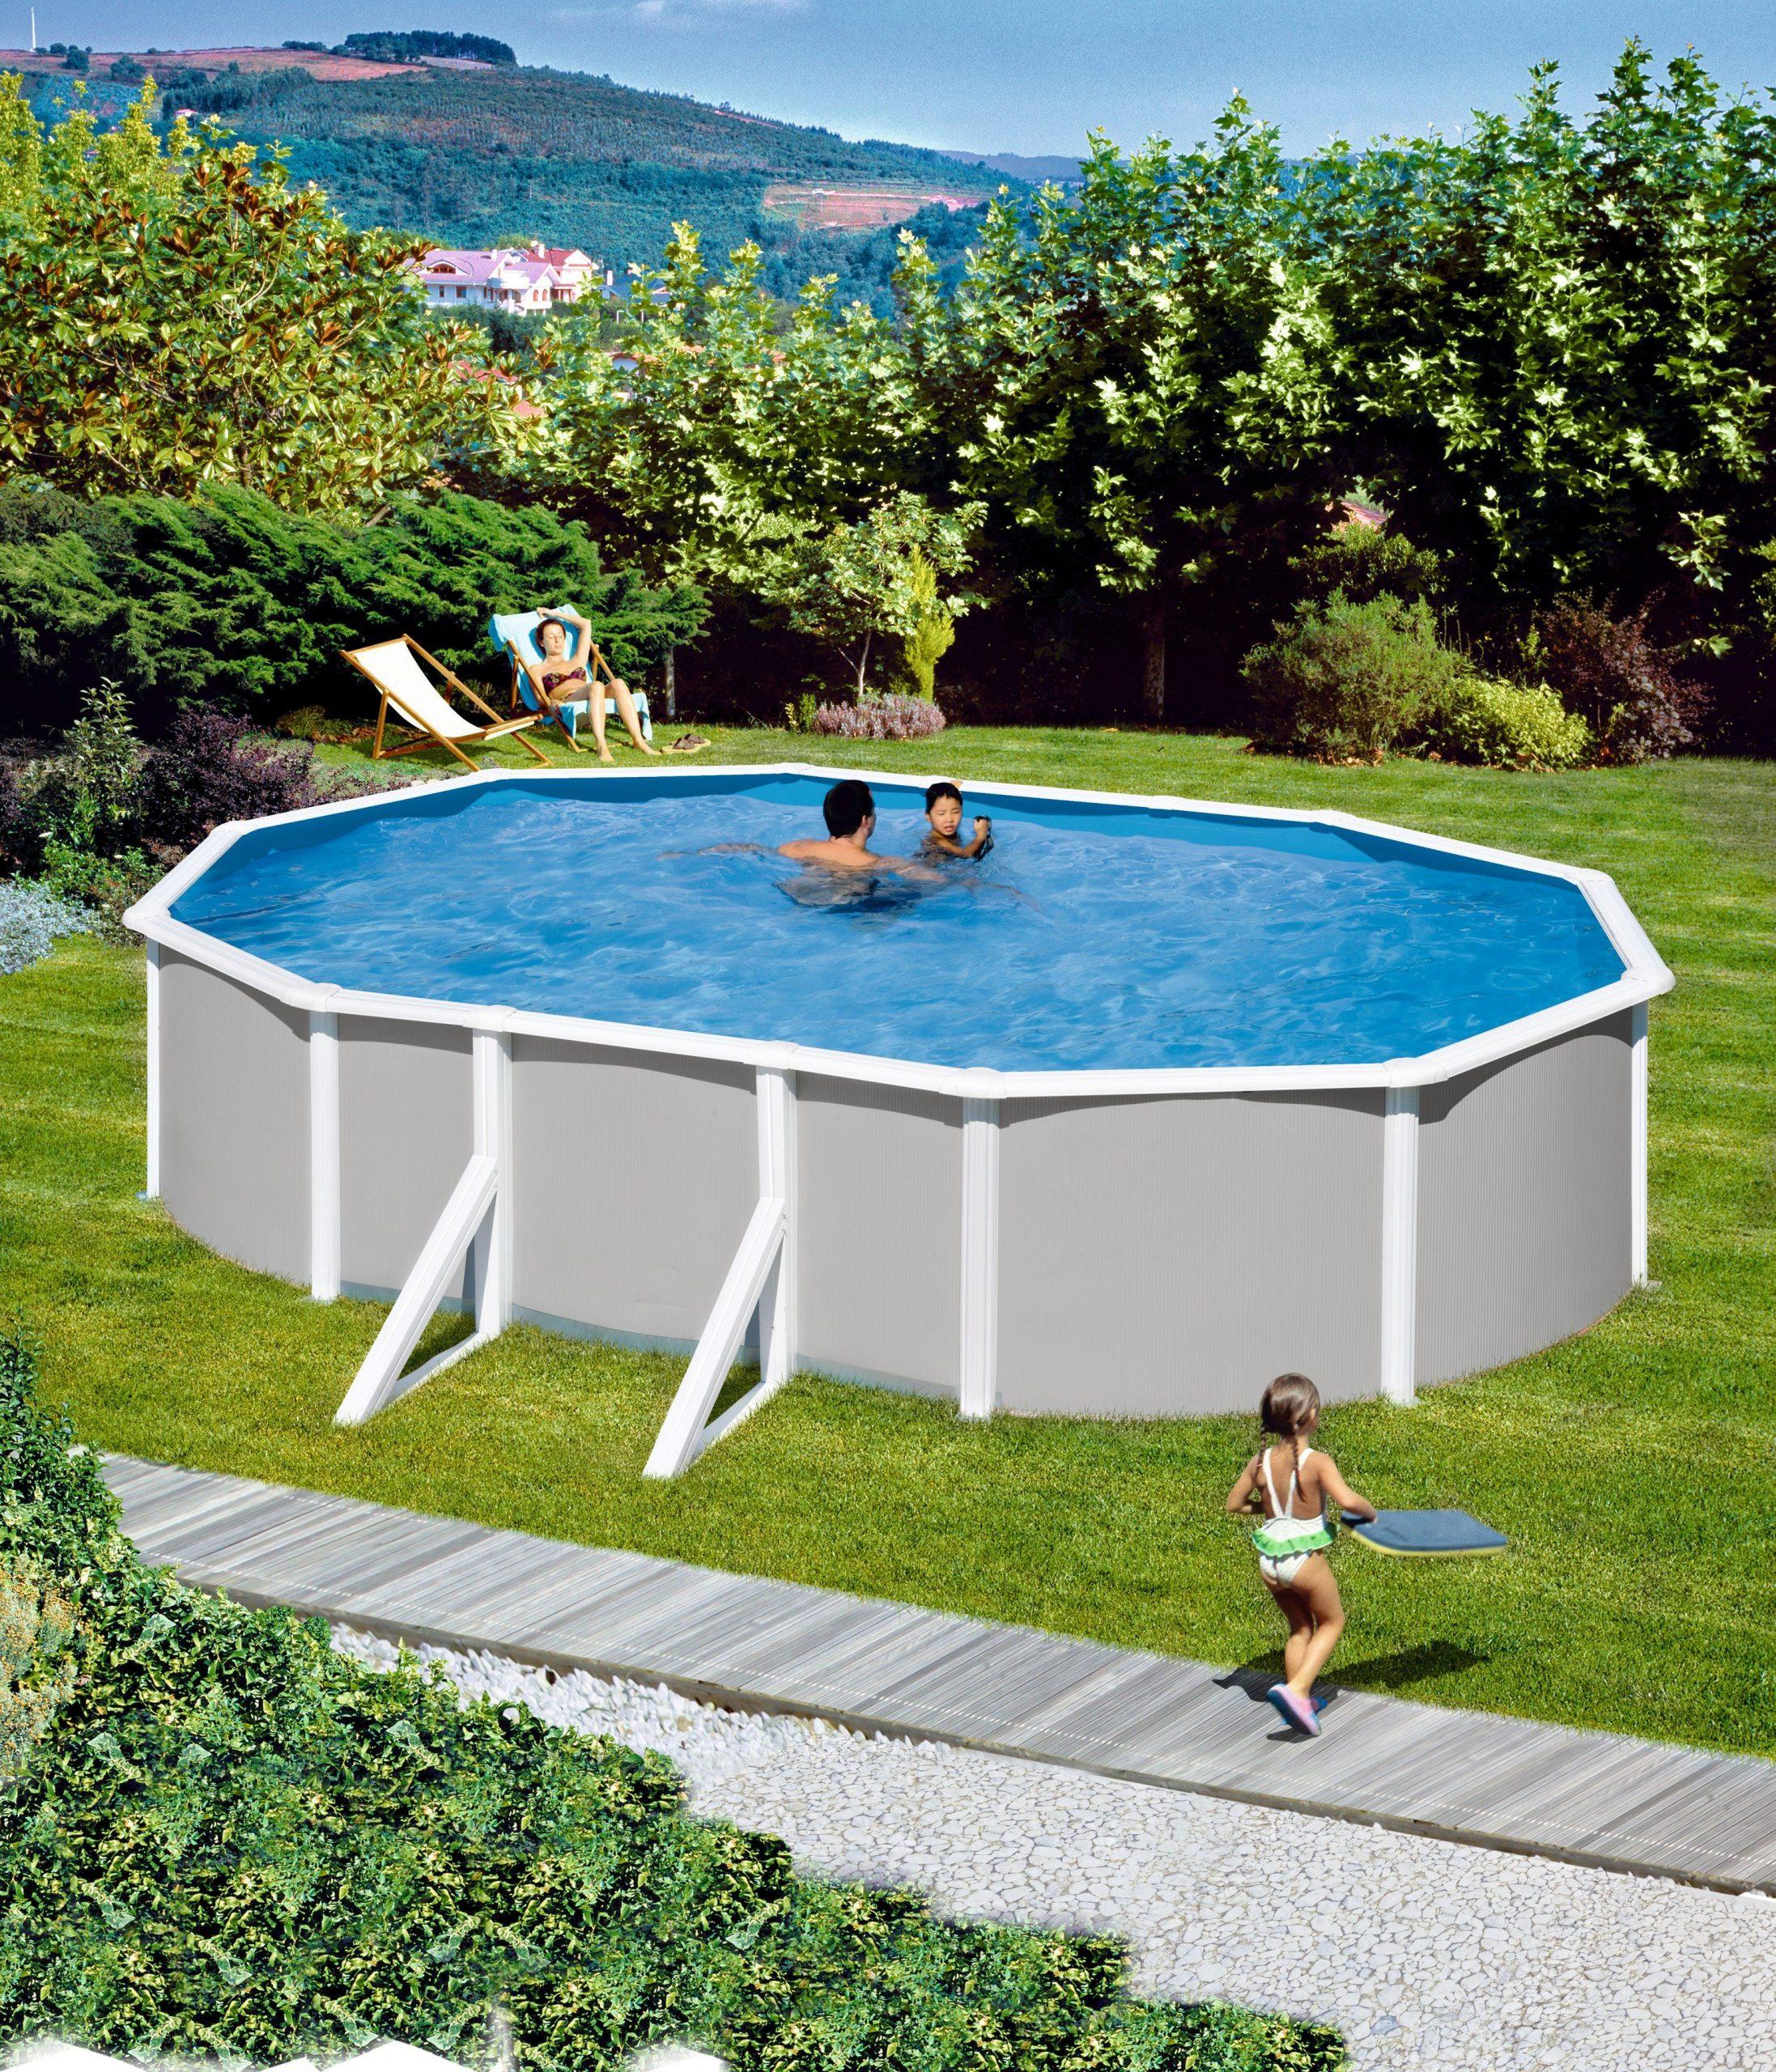 Full Size of Obi Pool Bestway Fast Medence Szett 366 Cm 76 Vsrlsa Az Garten Whirlpool Swimmingpool Immobilien Bad Homburg Einbauküche Nobilia Küche Mini Aufblasbar Im Wohnzimmer Obi Pool